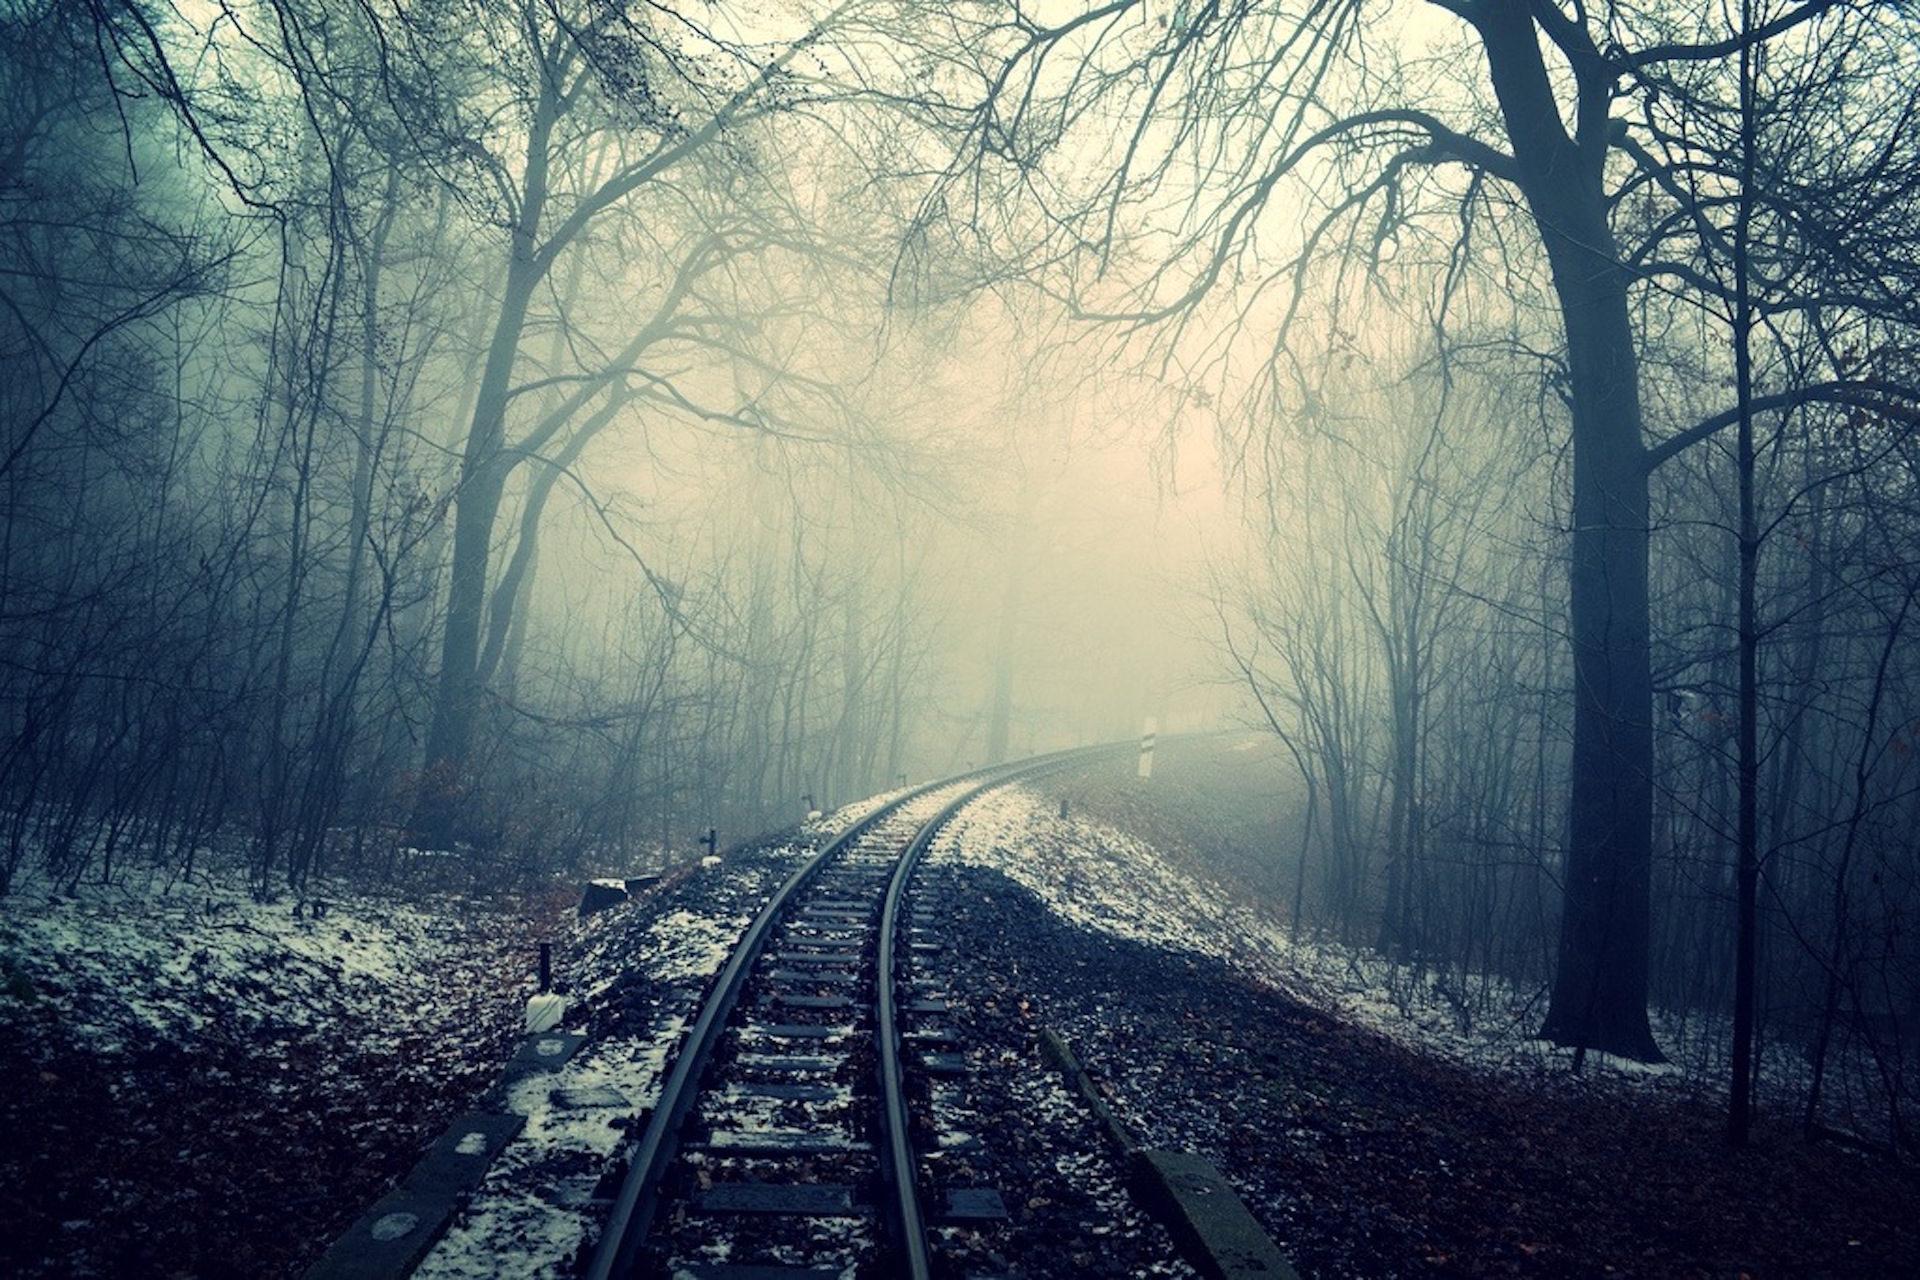 voies, train, brouillard, Forest, Soledad - Fonds d'écran HD - Professor-falken.com